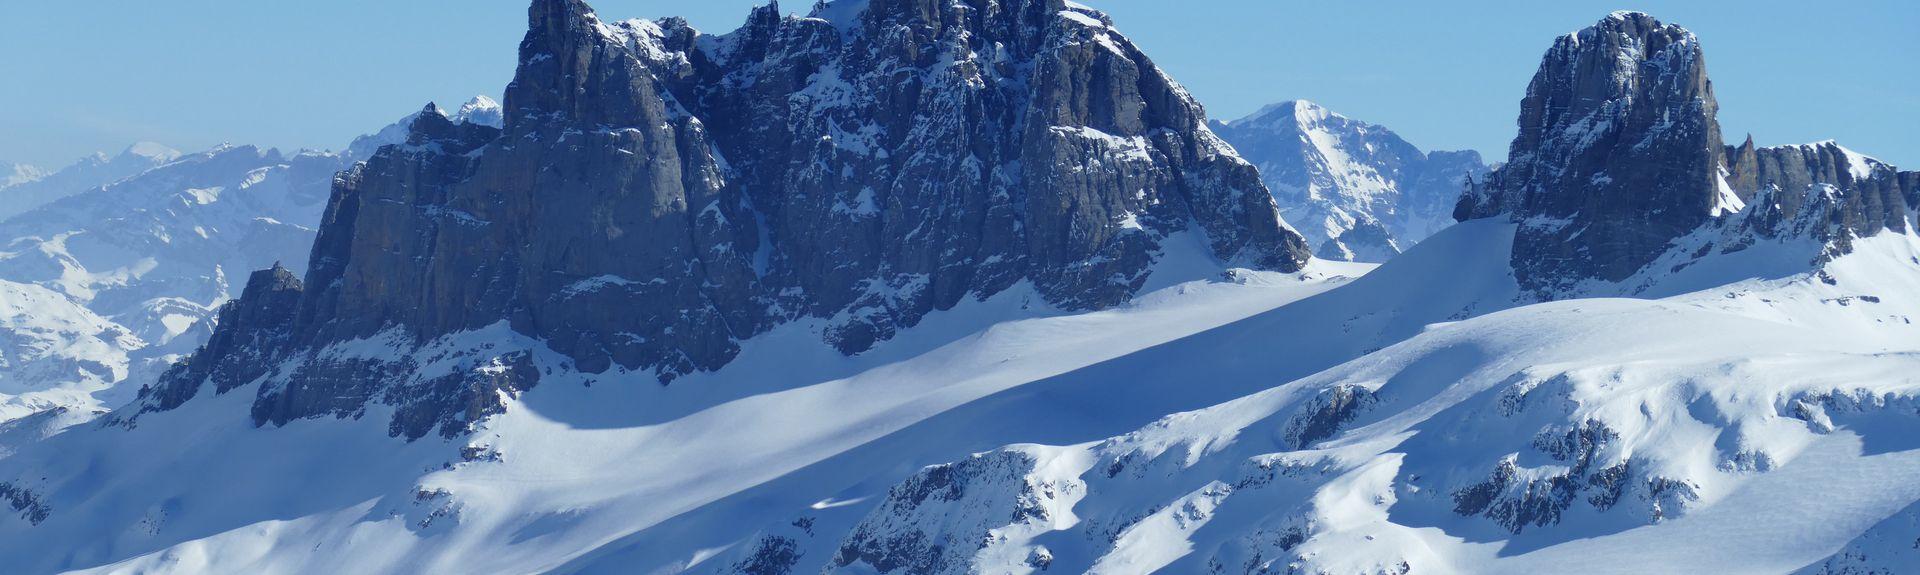 Duerstelen Ski Lift, Andermatt, Switzerland